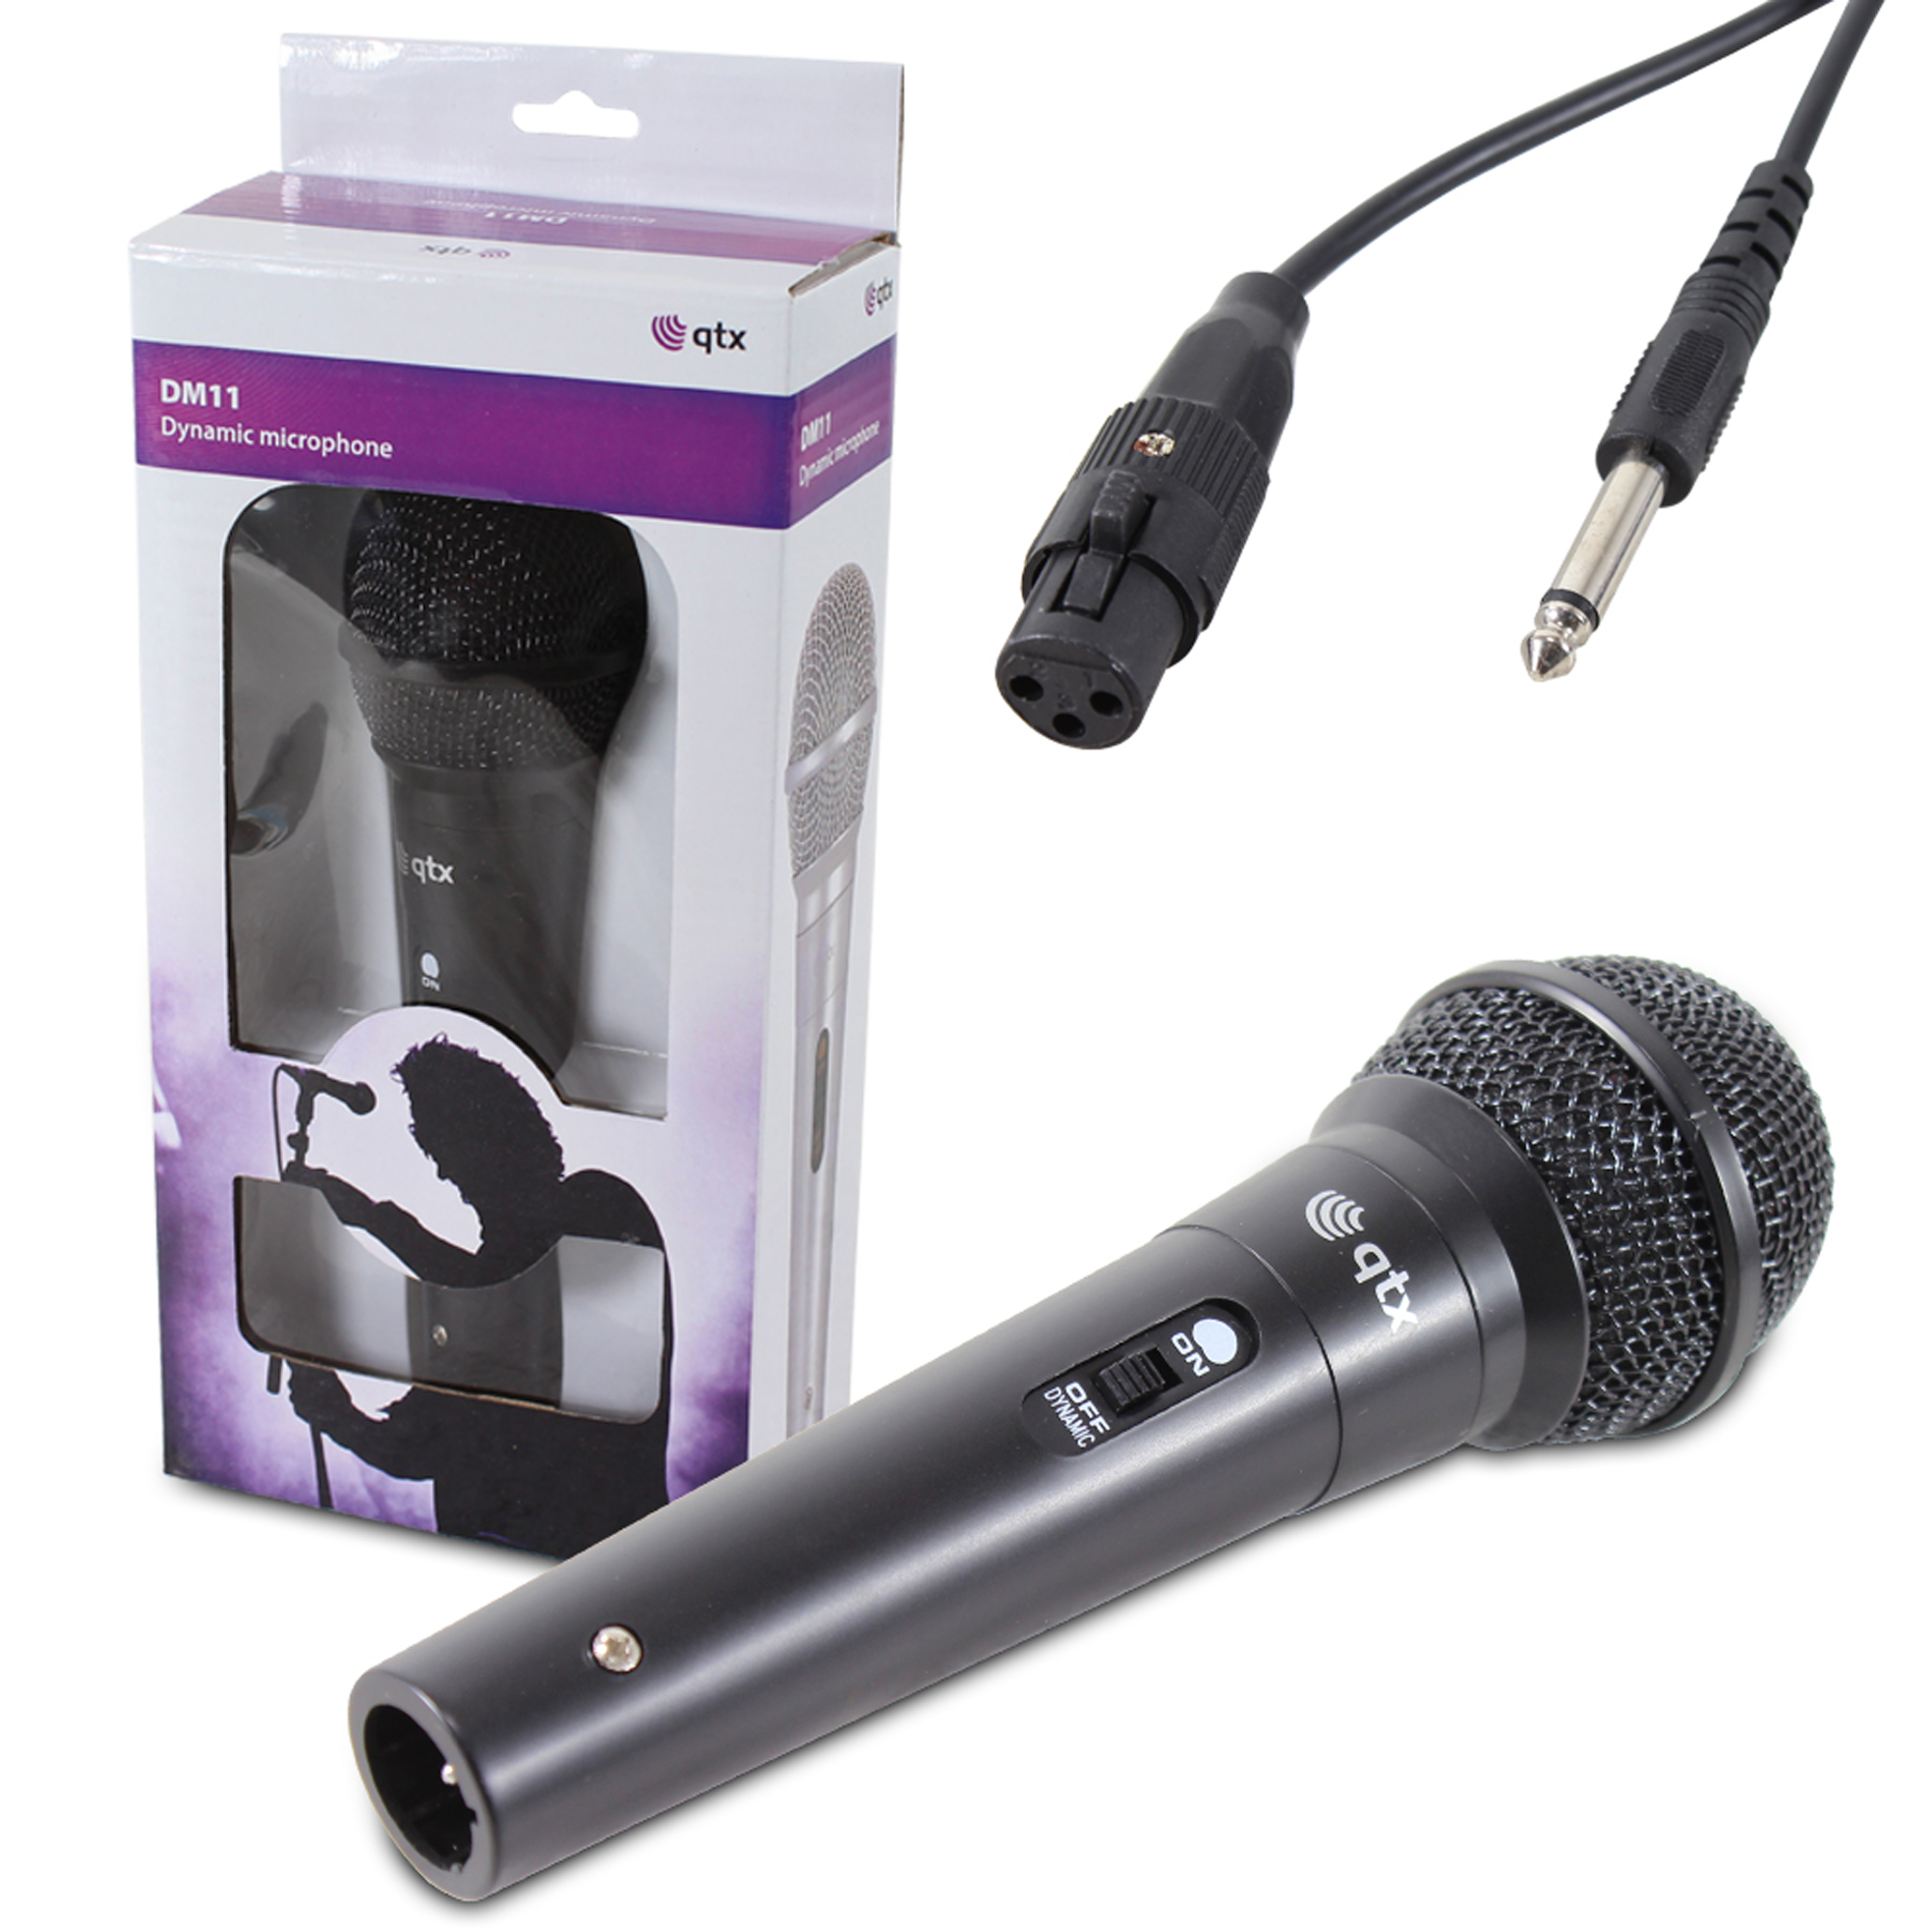 QTX DM-11 Handheld Wired Microphone